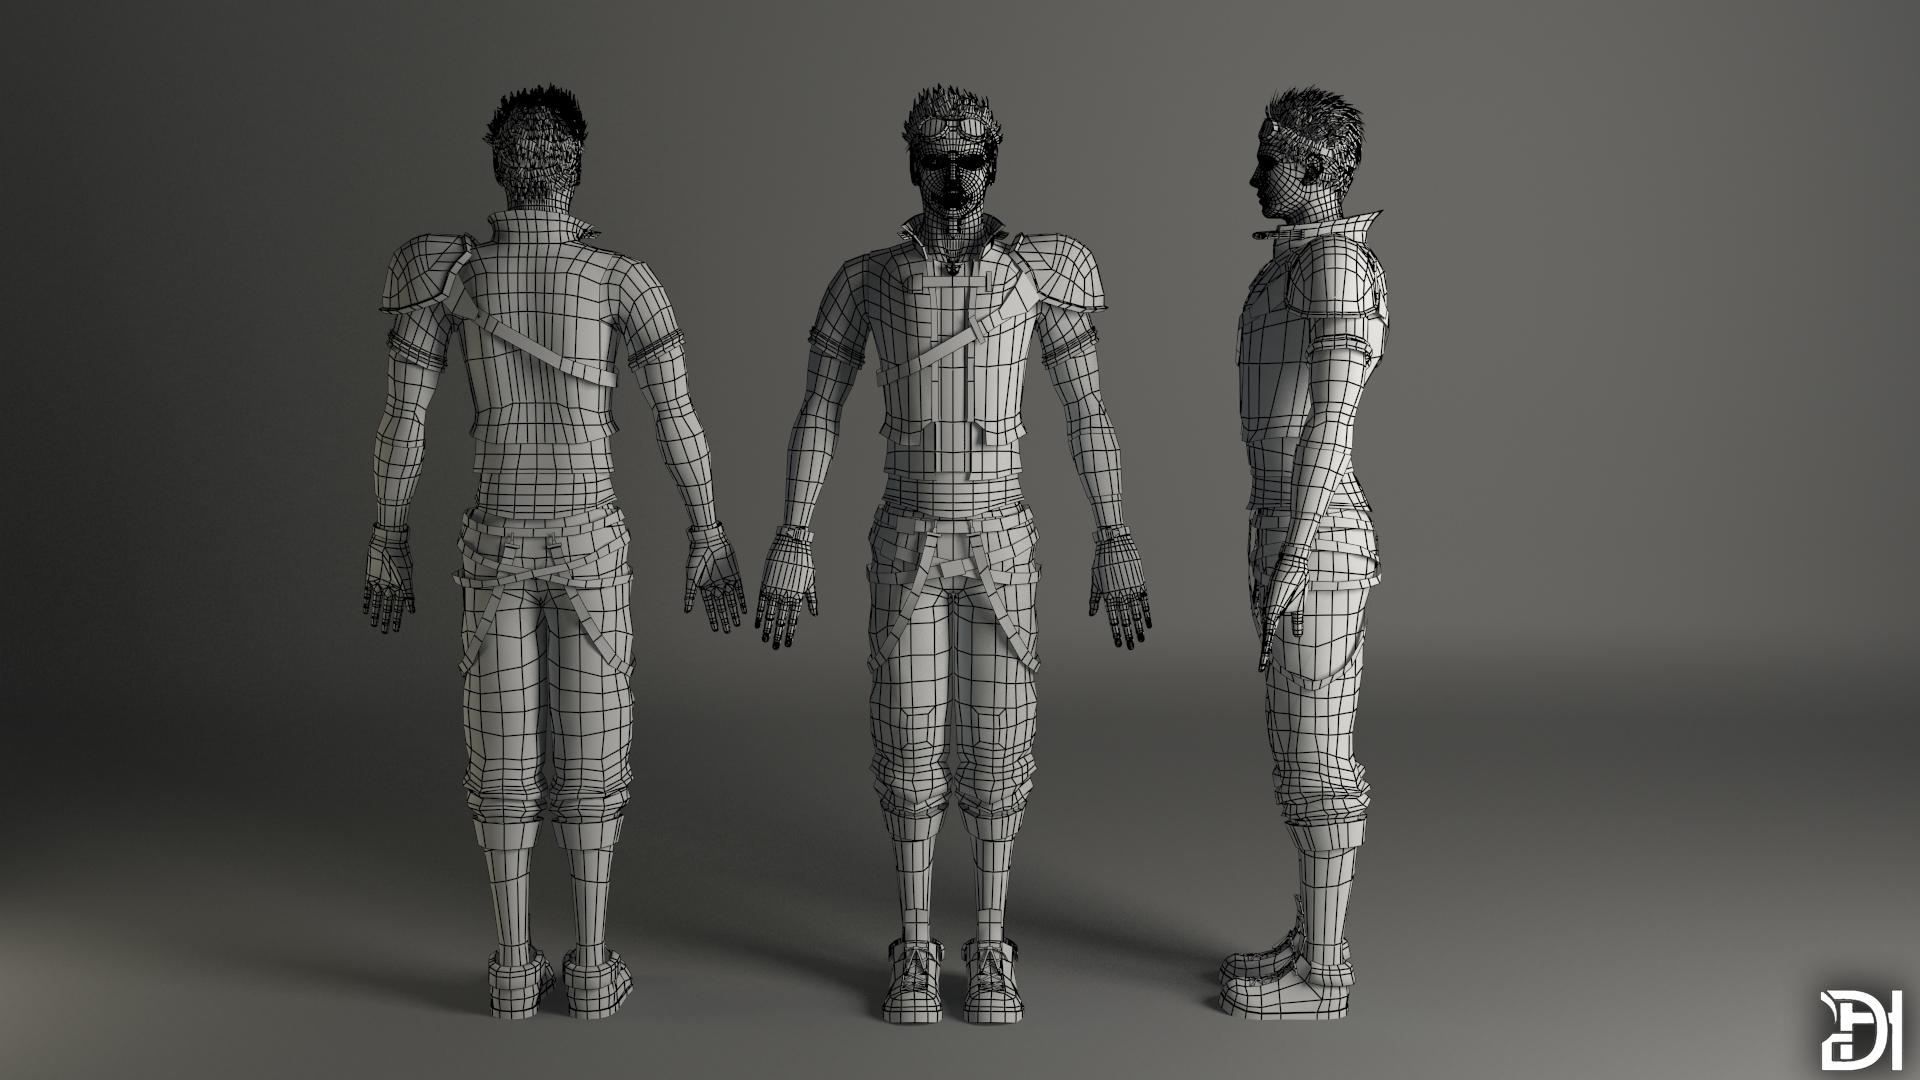 Full Character Wireframe Render By 02wdhull On DeviantArt